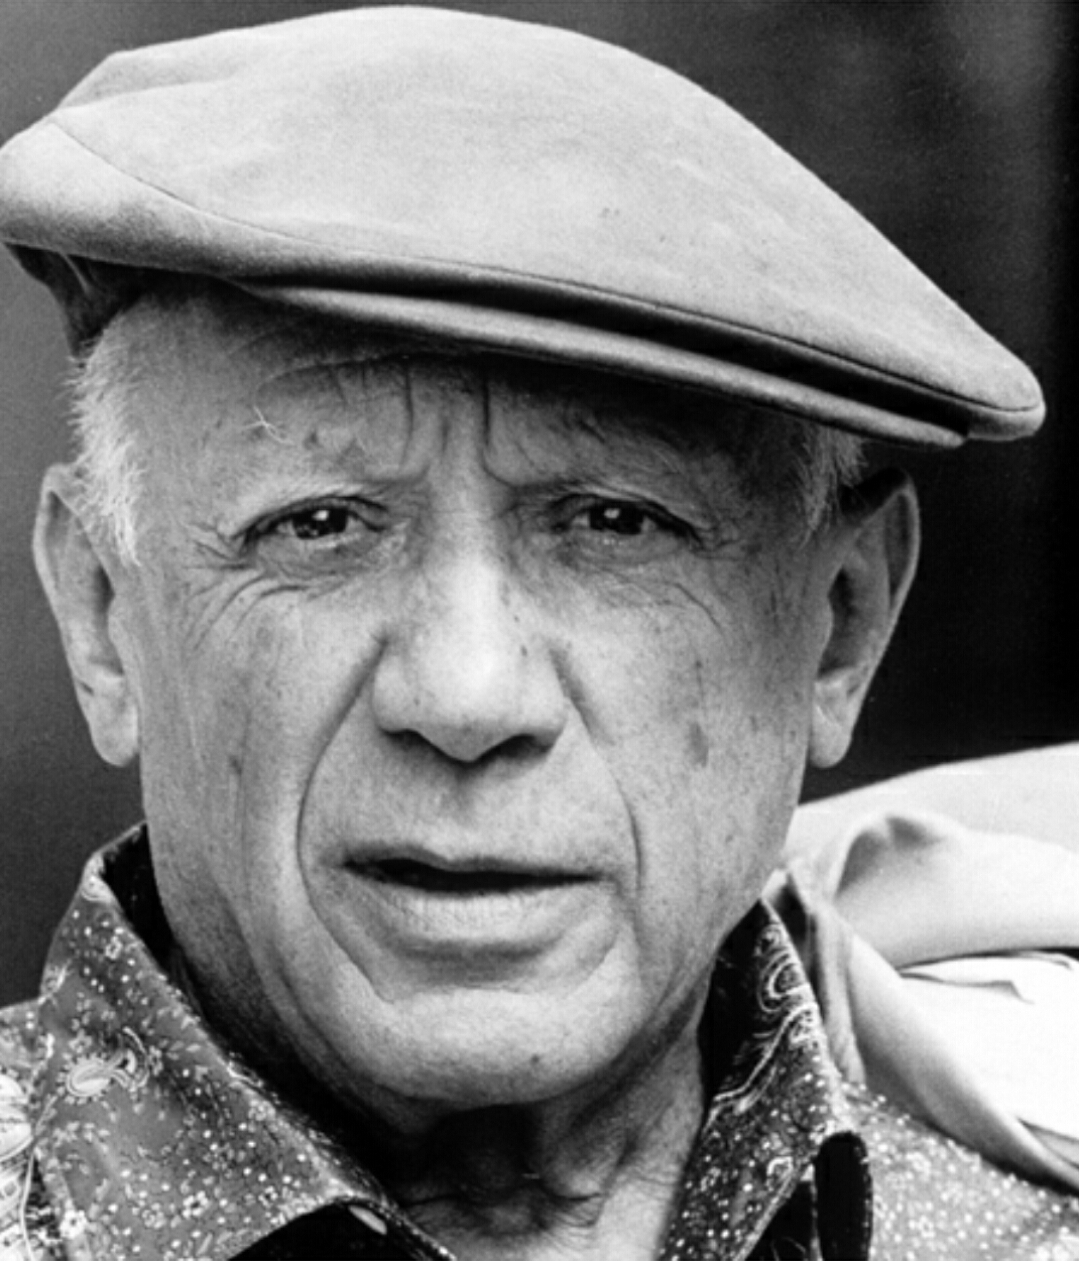 Resultado de imagen para Pablo Picasso